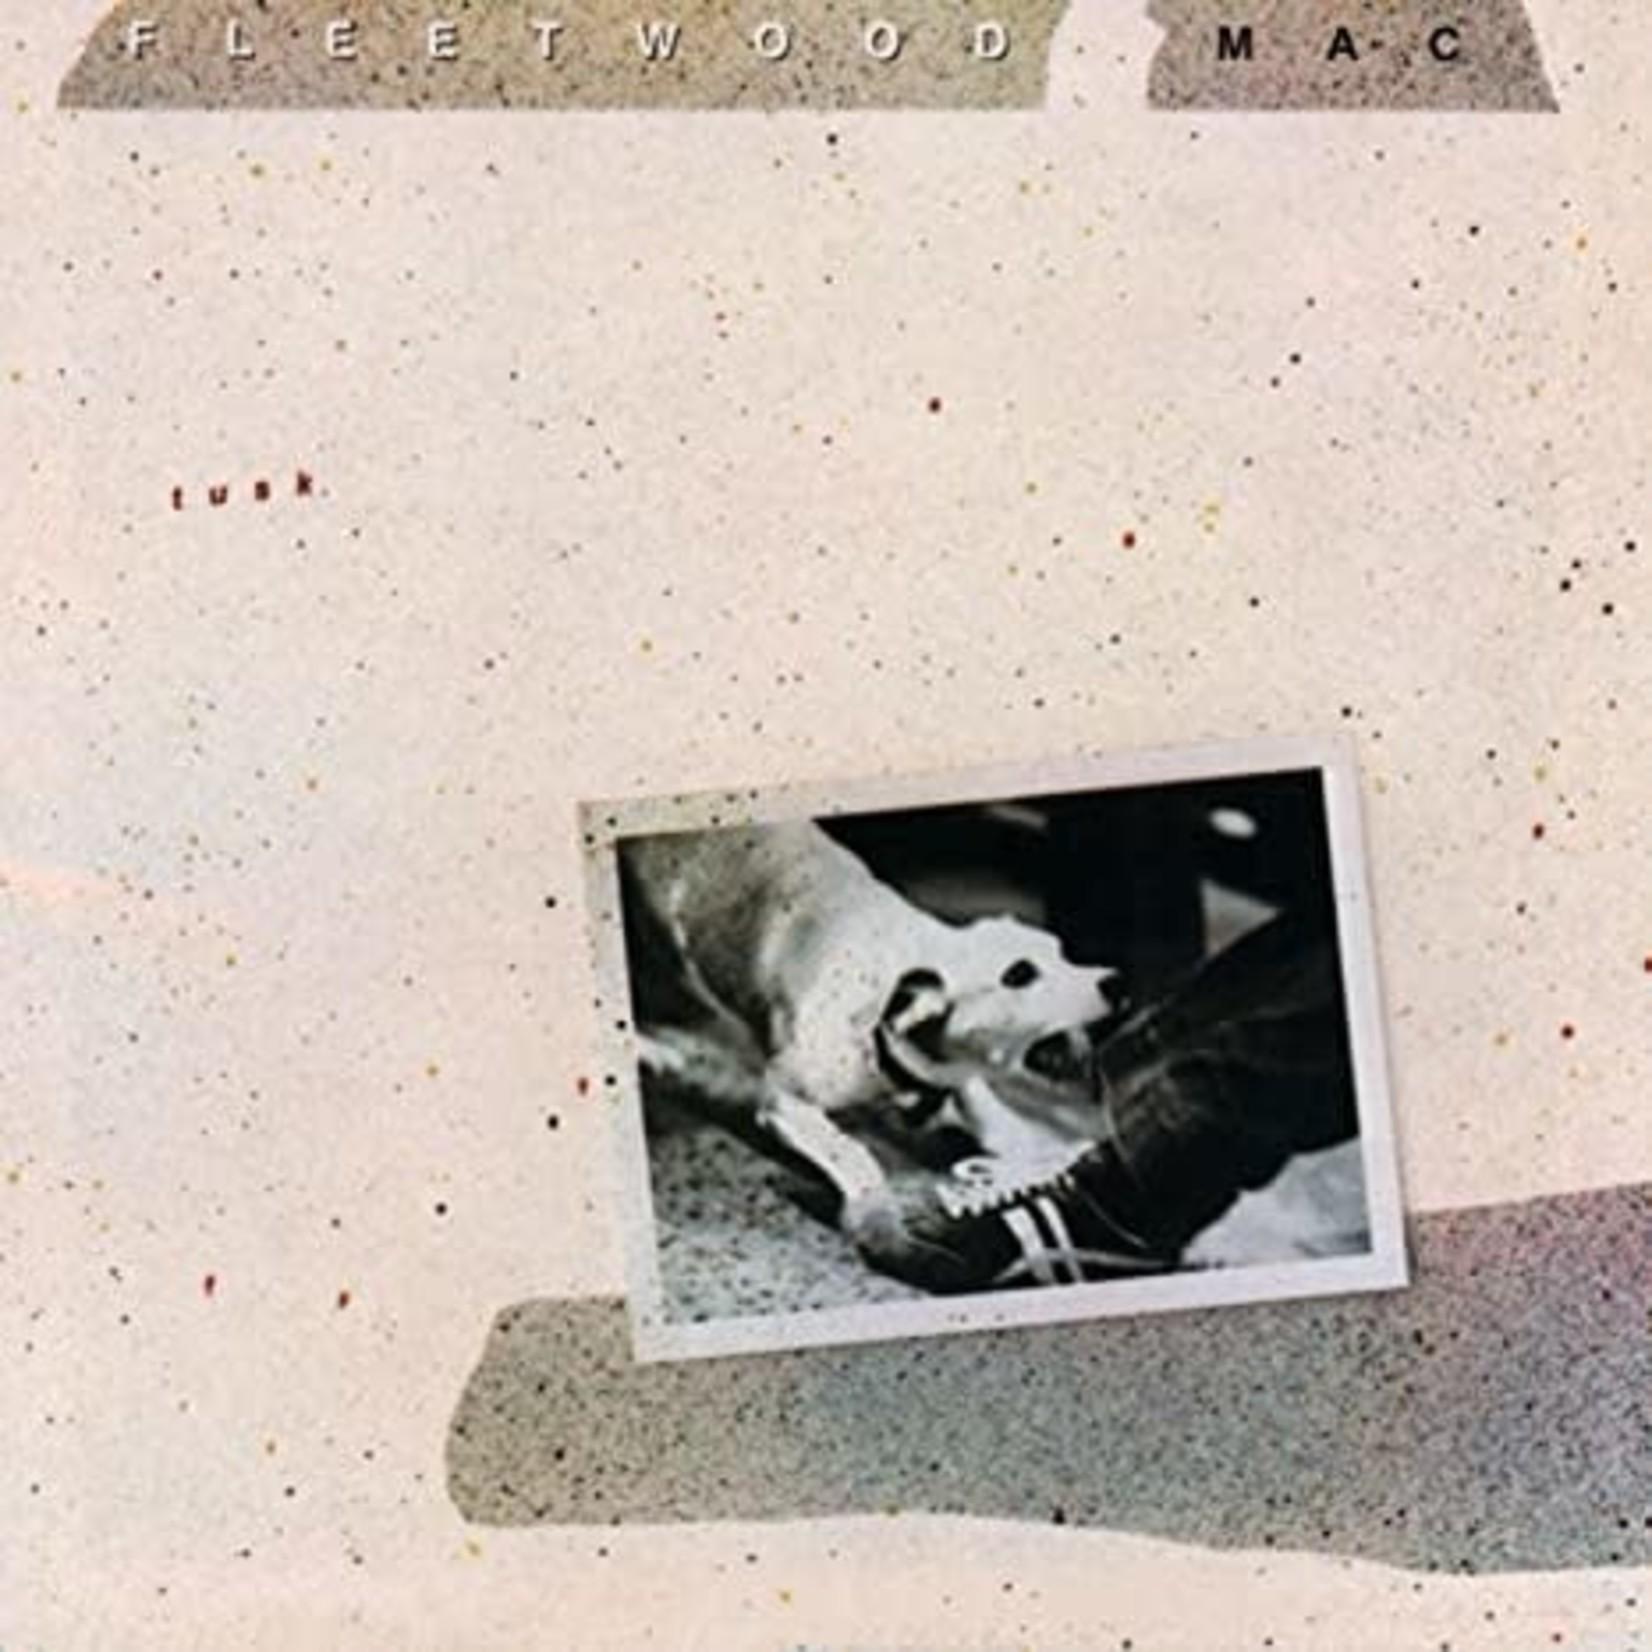 Fleetwood Mac: Tusk (2LP) [RHINO]